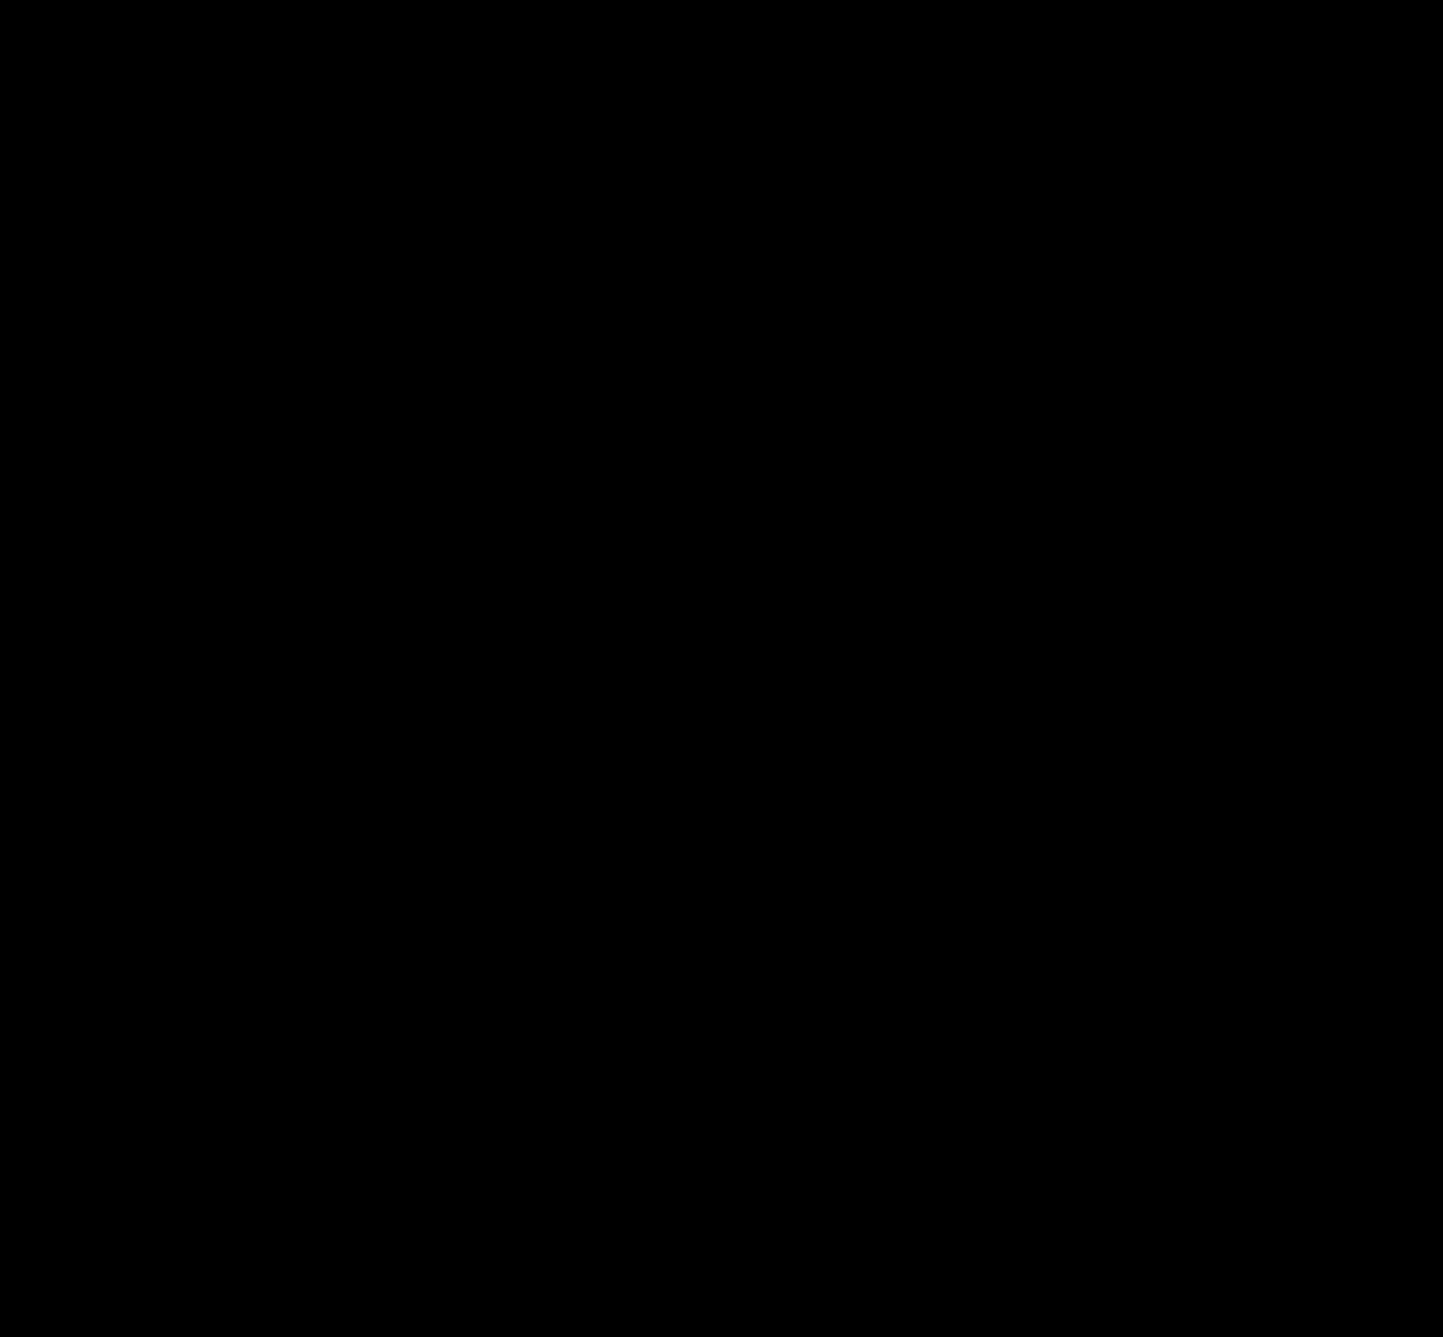 America's Cup Logo